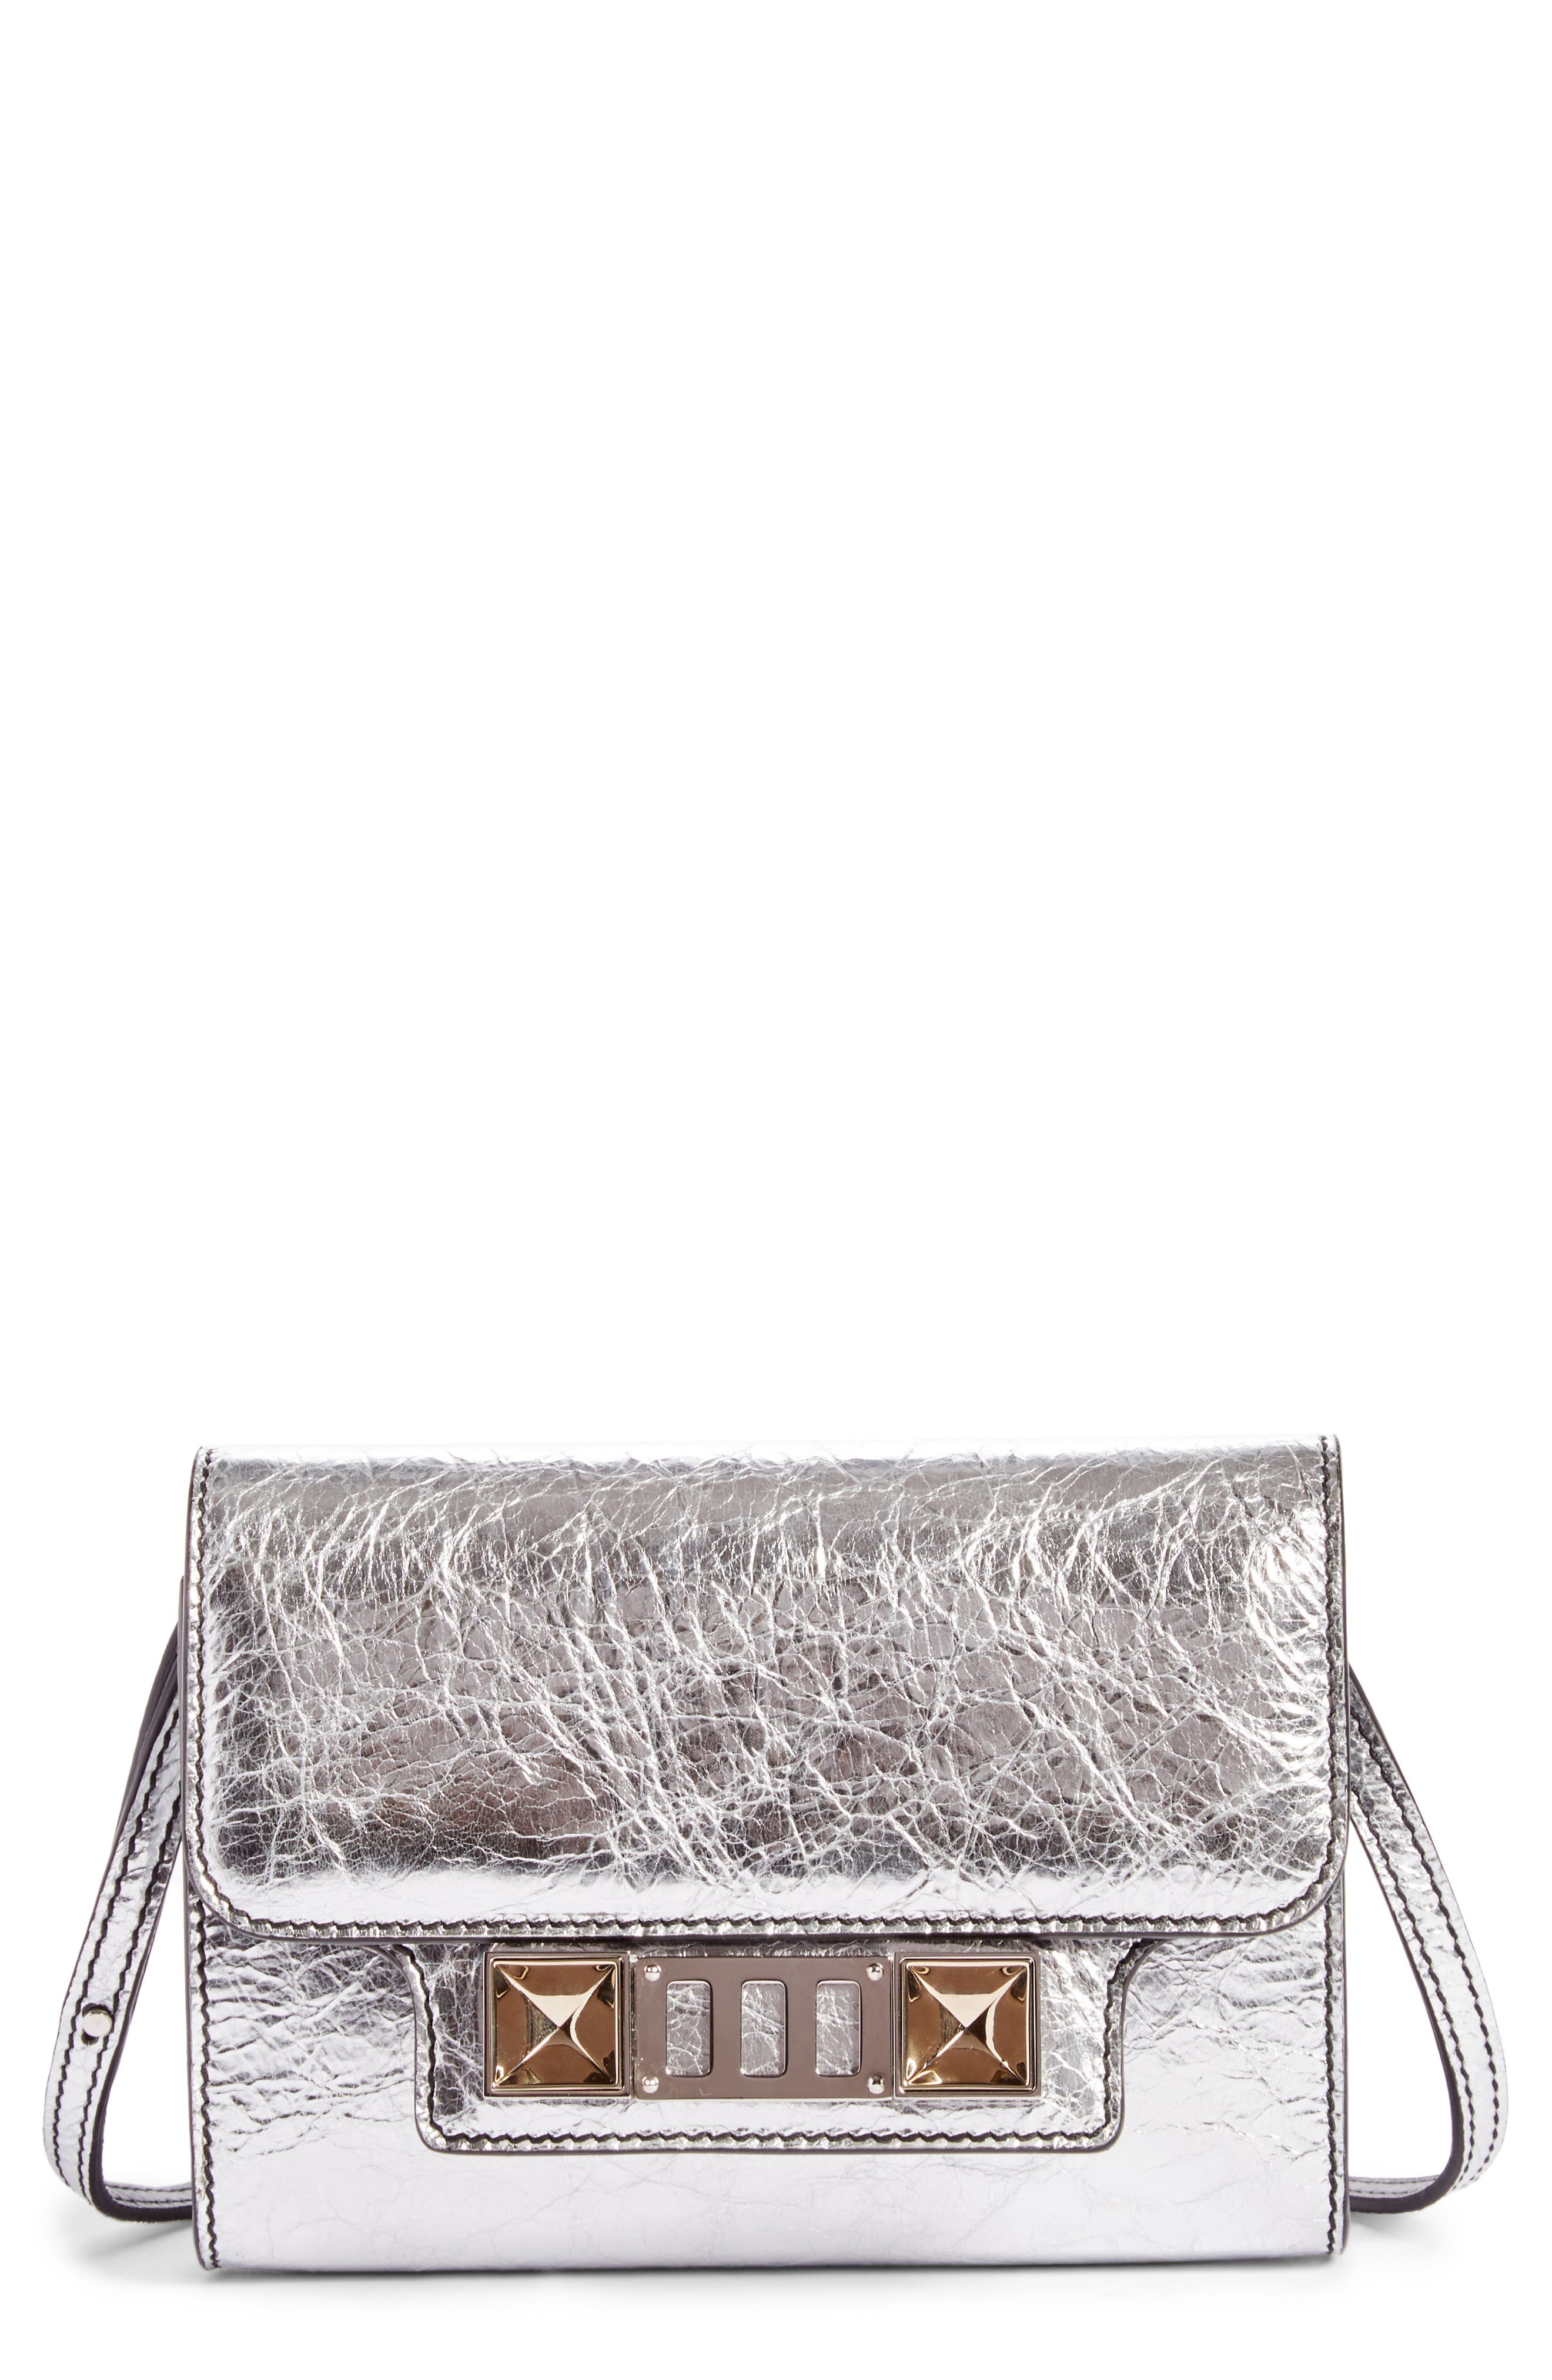 Alternate Image 1 Selected - Proenza Schouler PS11 Leather Crossbody Wallet